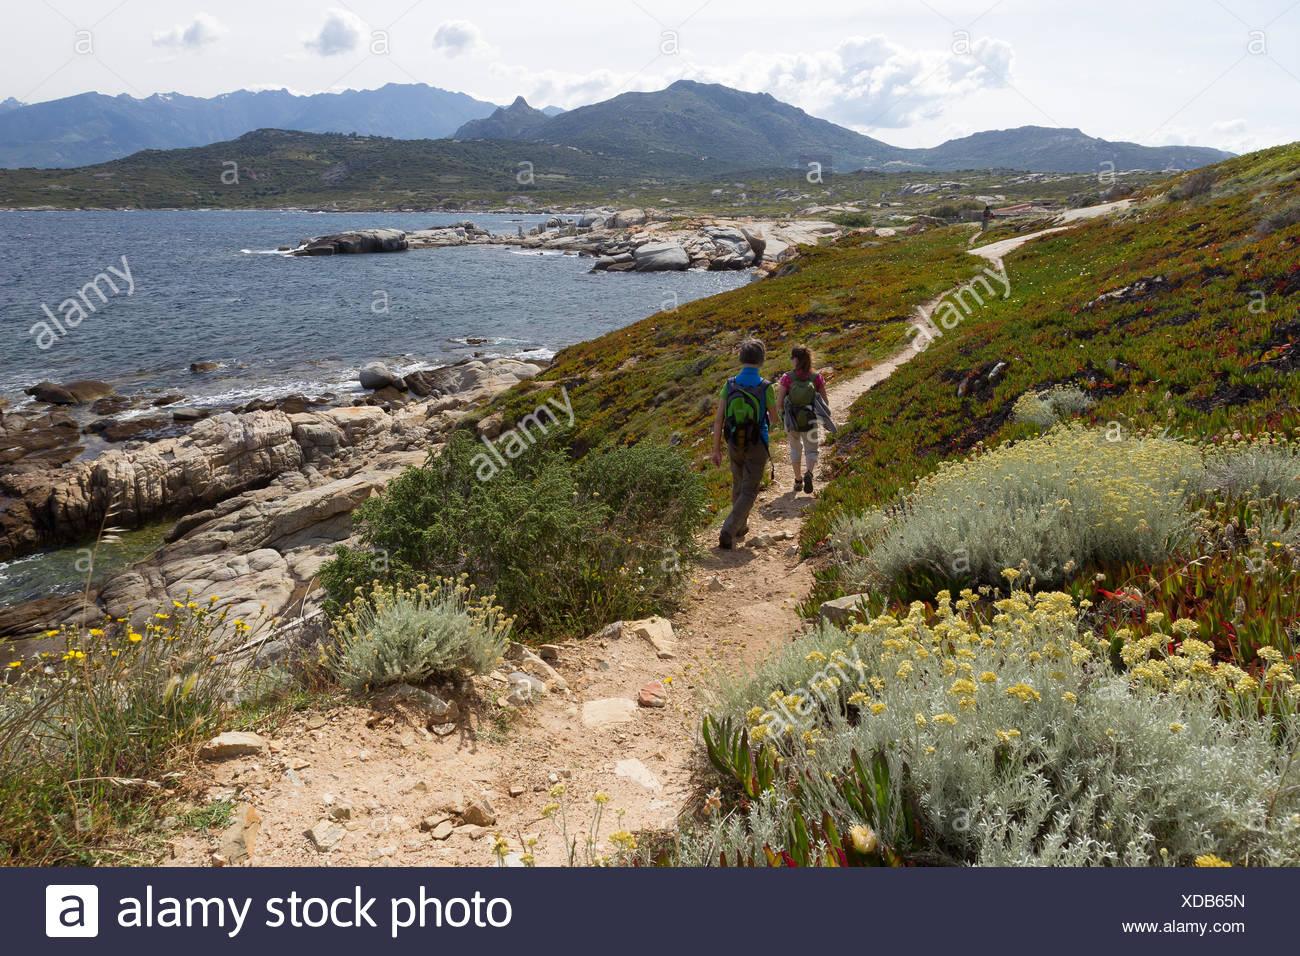 coastal hiking in corsica - Stock Image